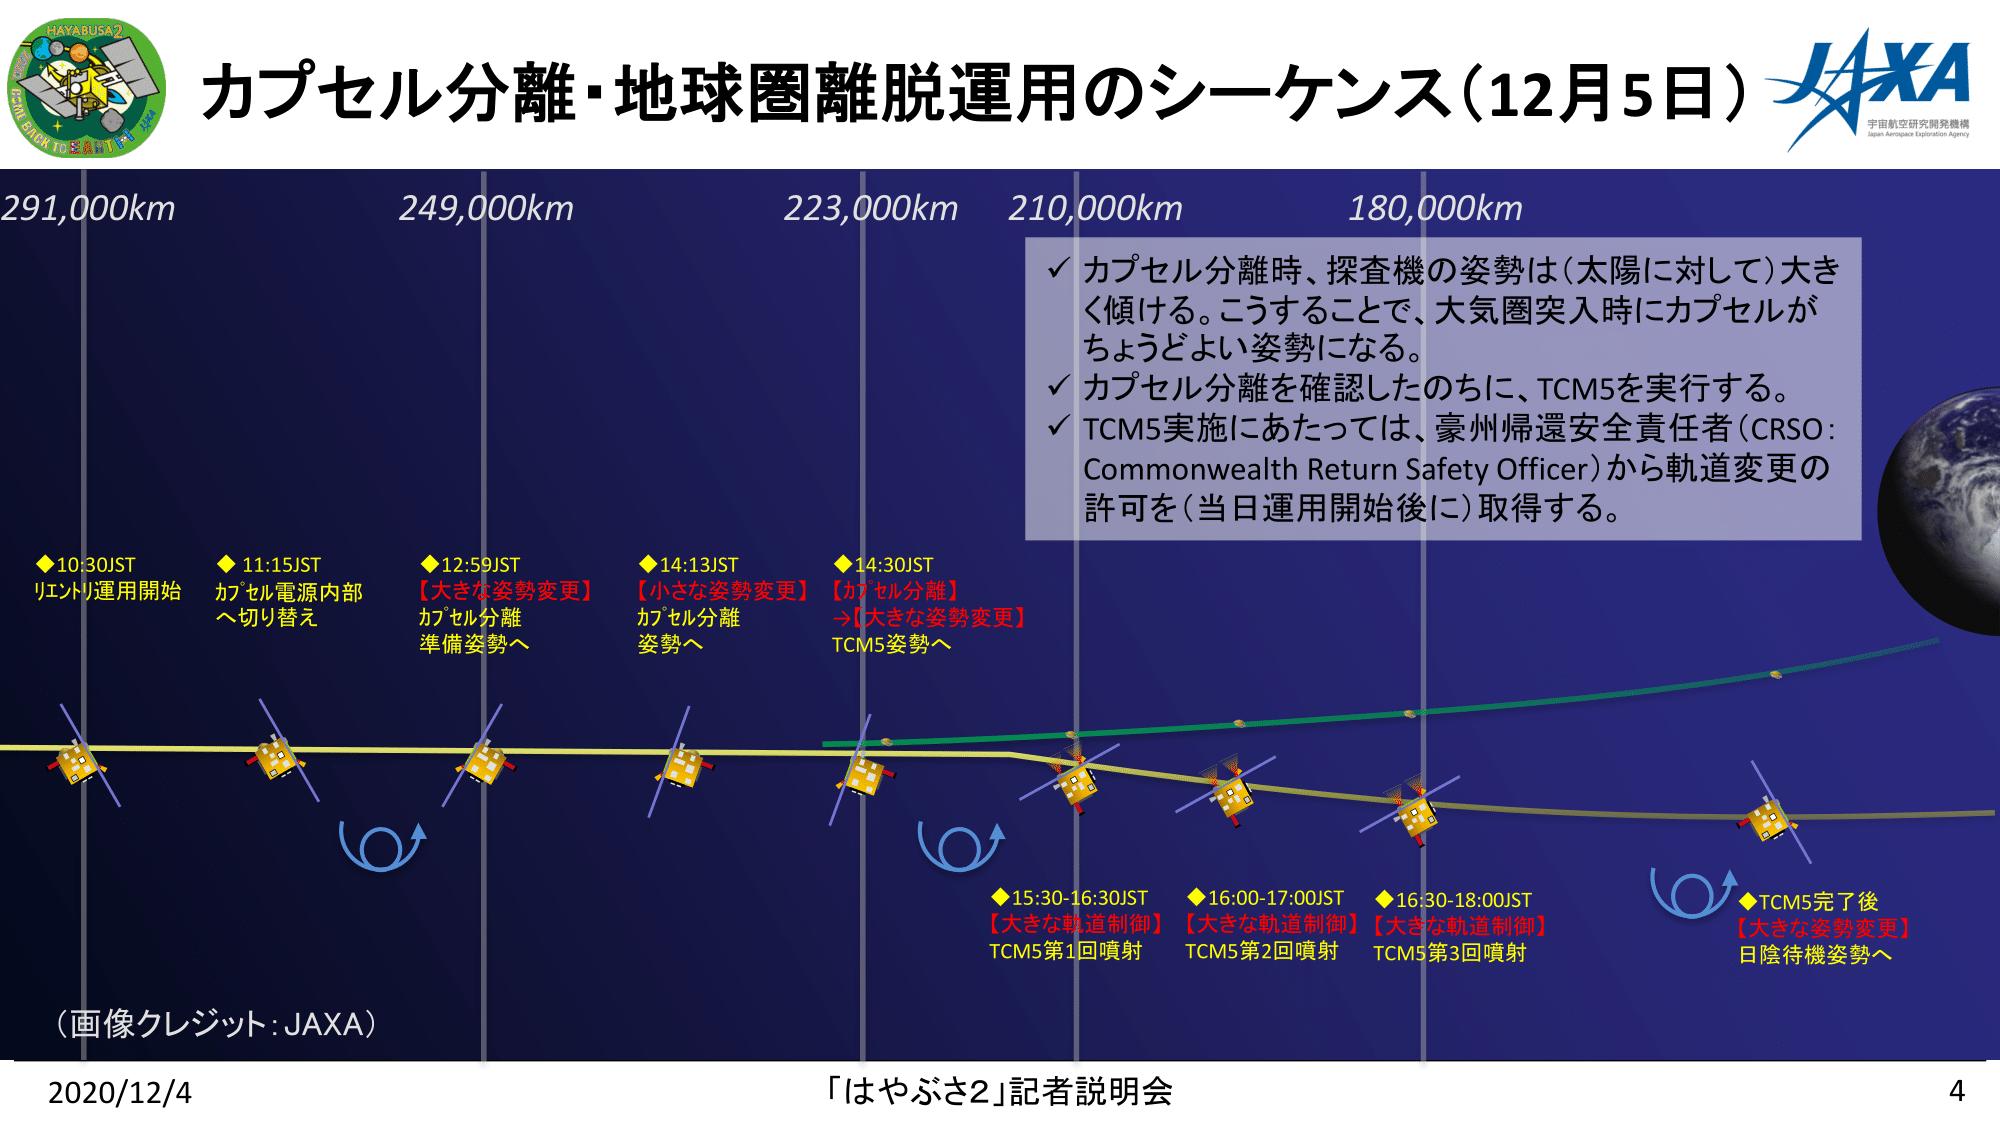 f:id:Imamura:20201204153724p:plain